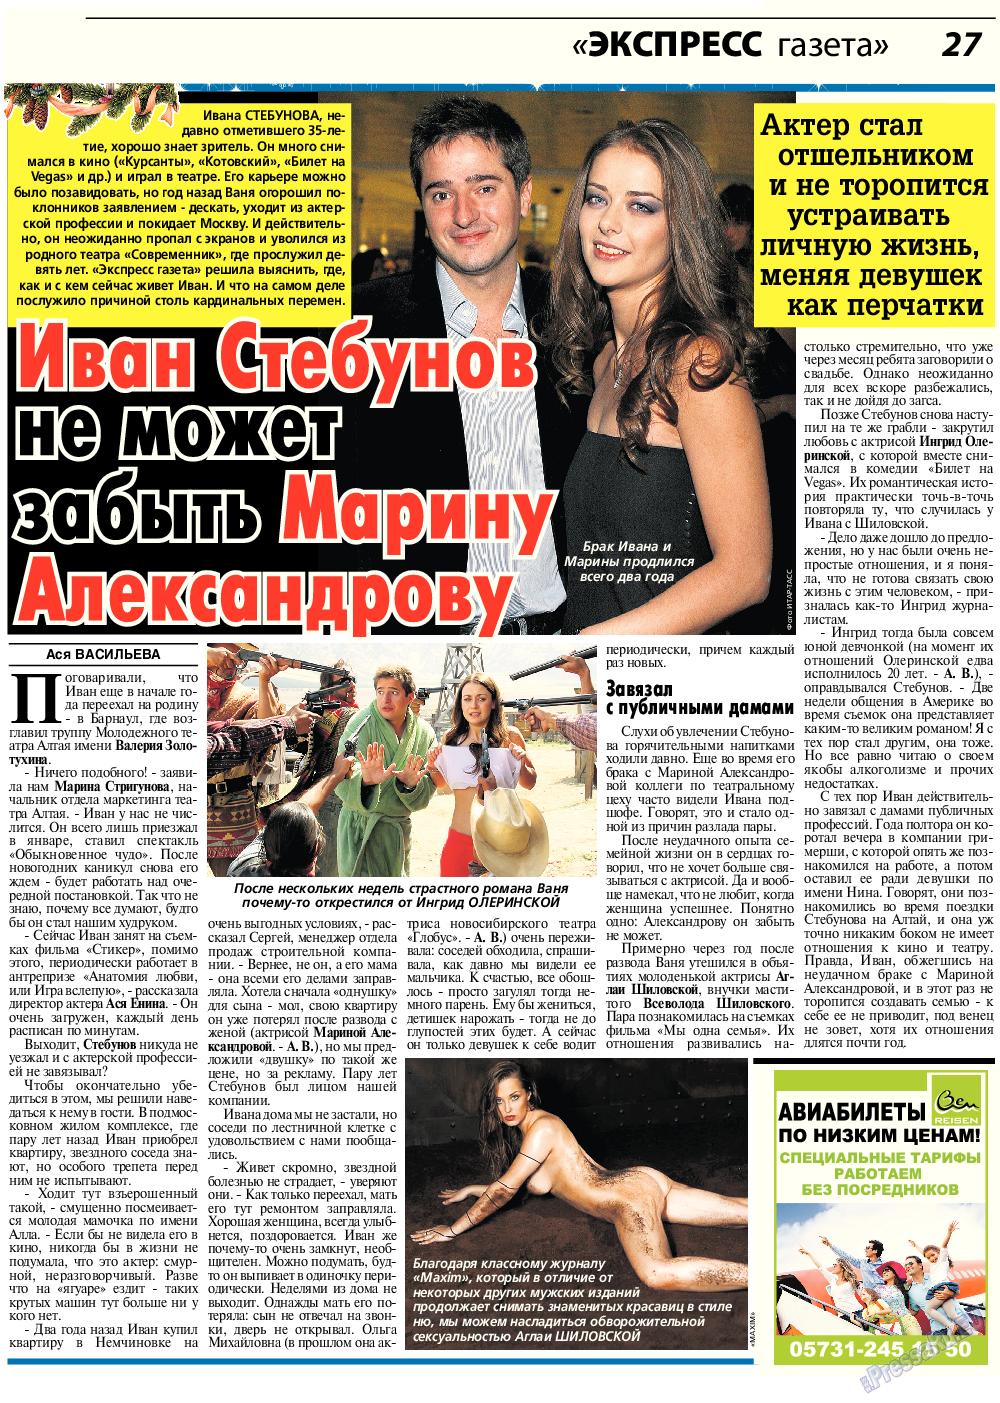 Экспресс газета (газета). 2017 год, номер 2, стр. 27